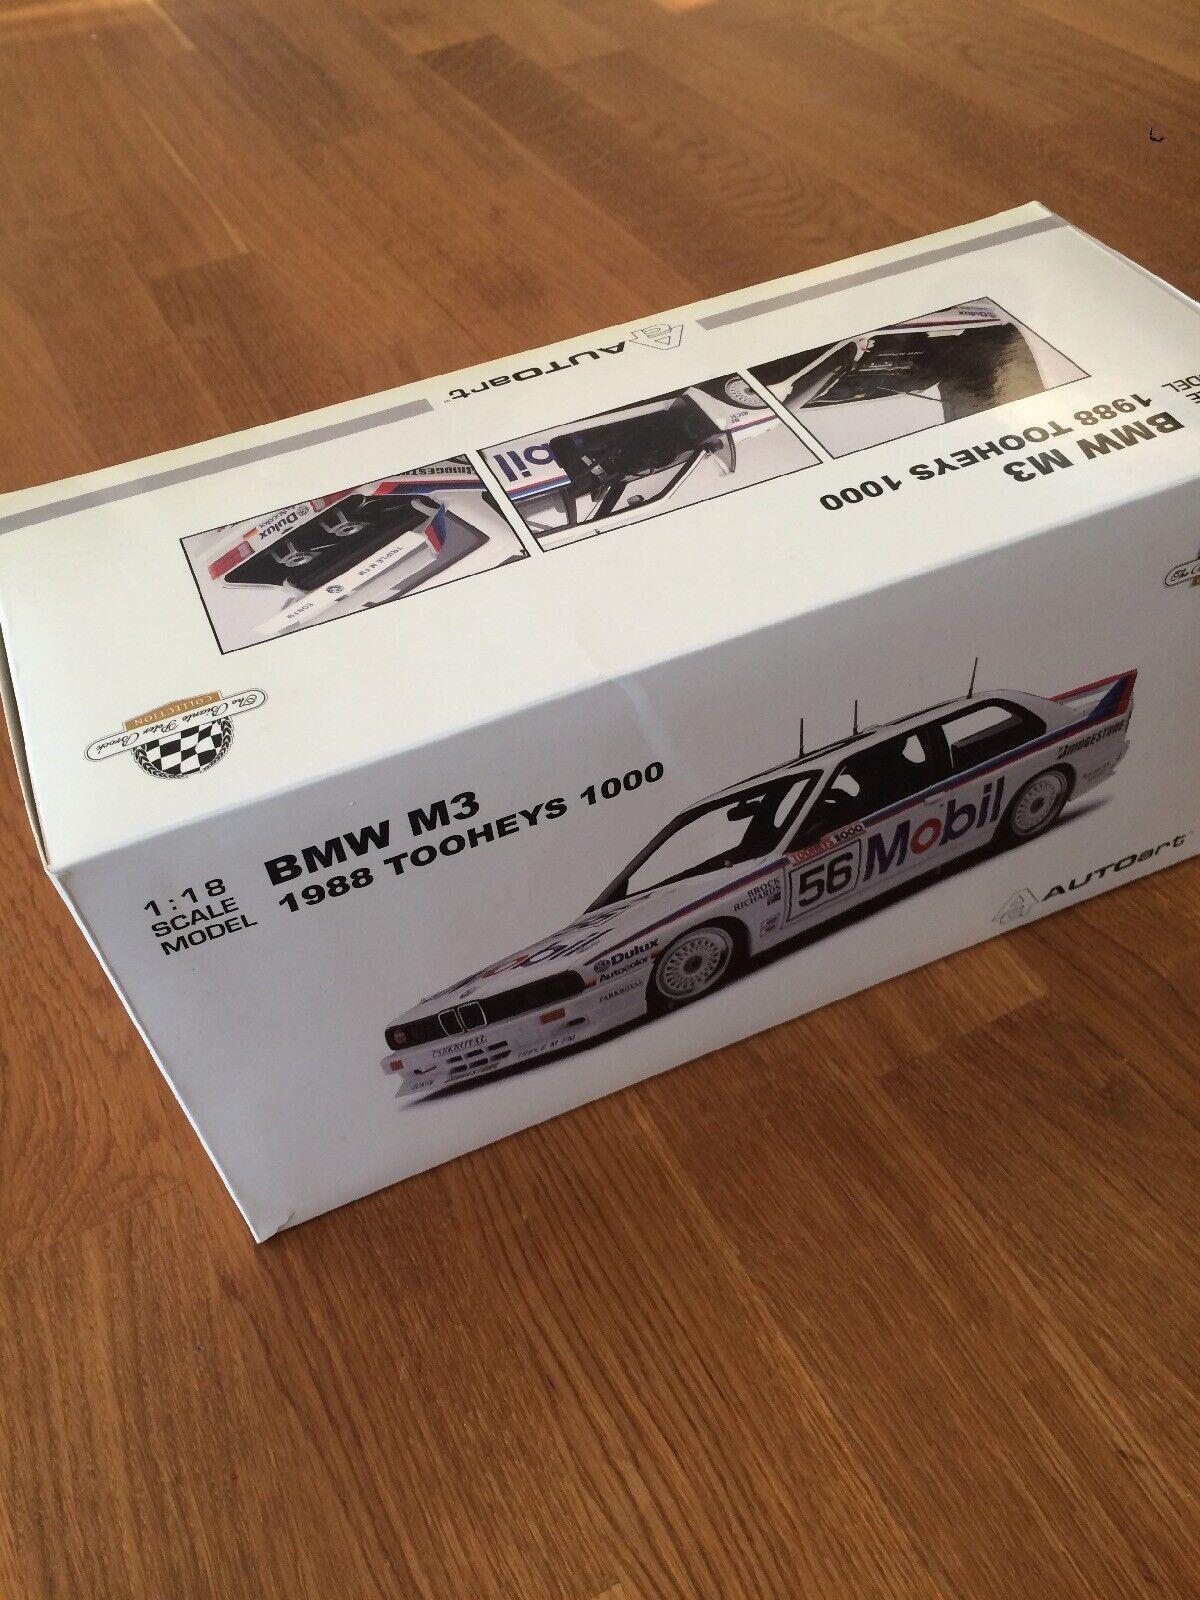 BMW E30 M3 1988 1 18 Tooheys 1000 Autoart Brock Richards 56 Mobil